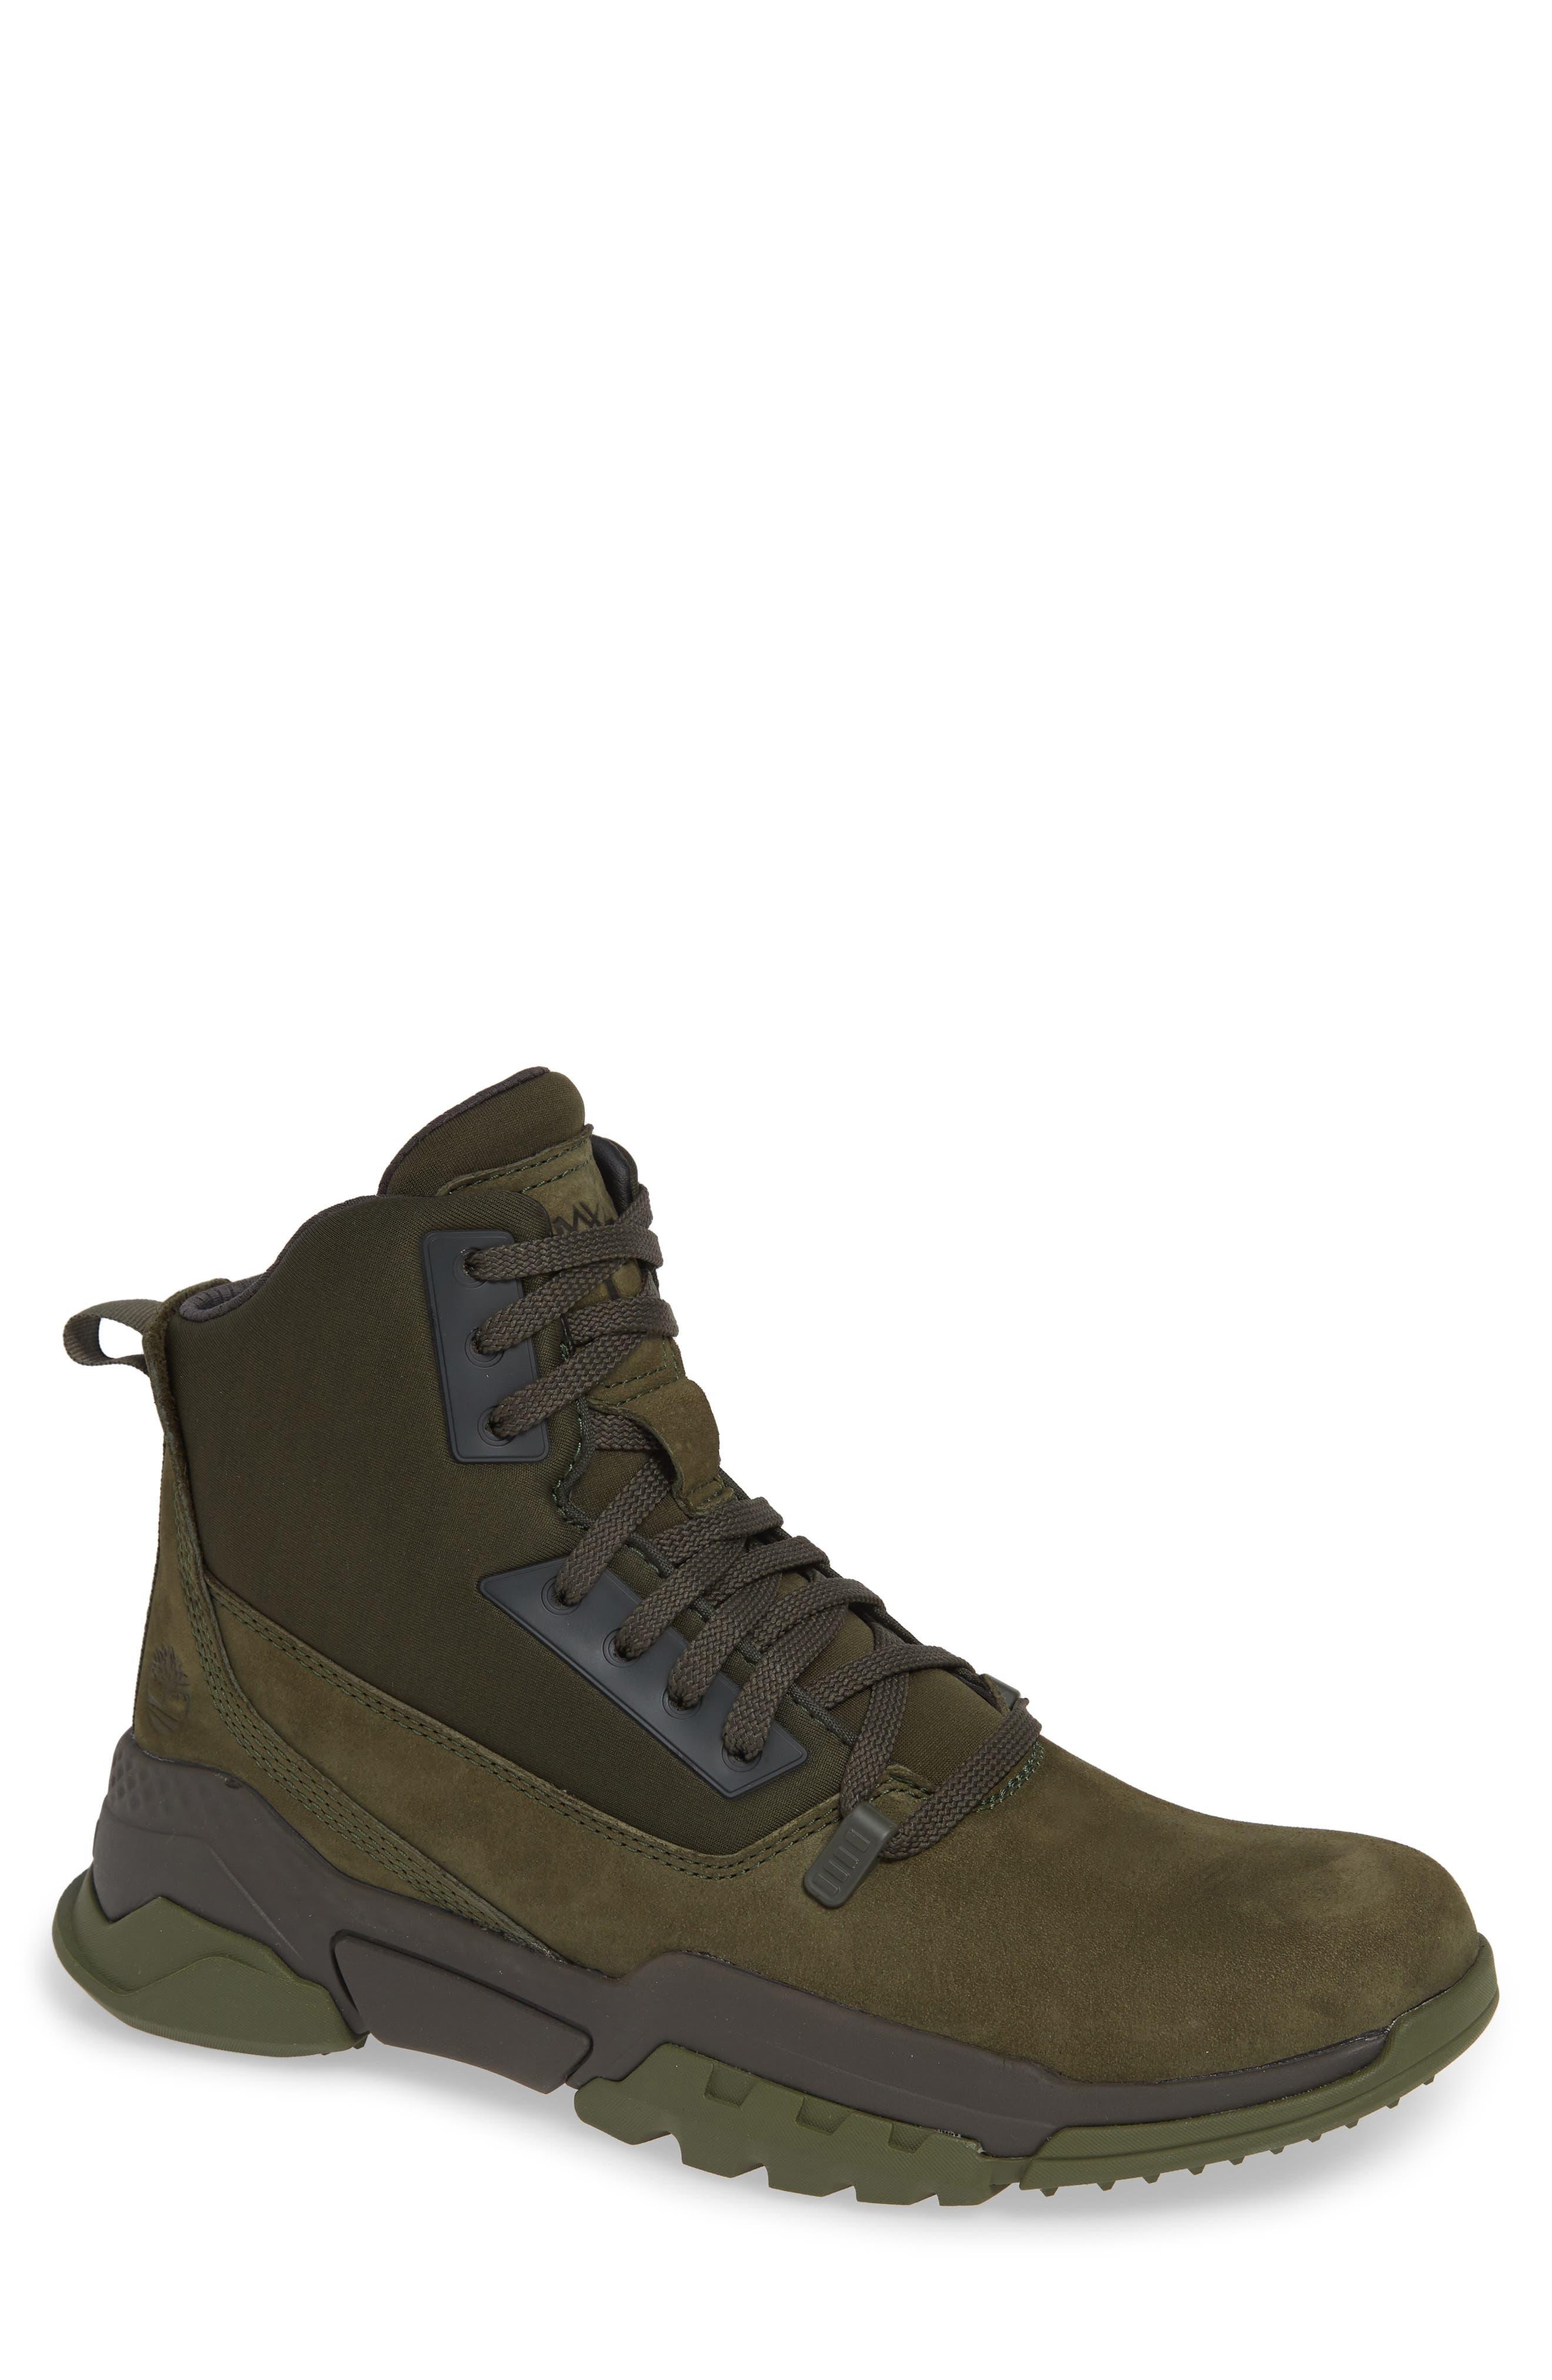 City Force Boot,                         Main,                         color, GRAPE/ GREY NUBUCK